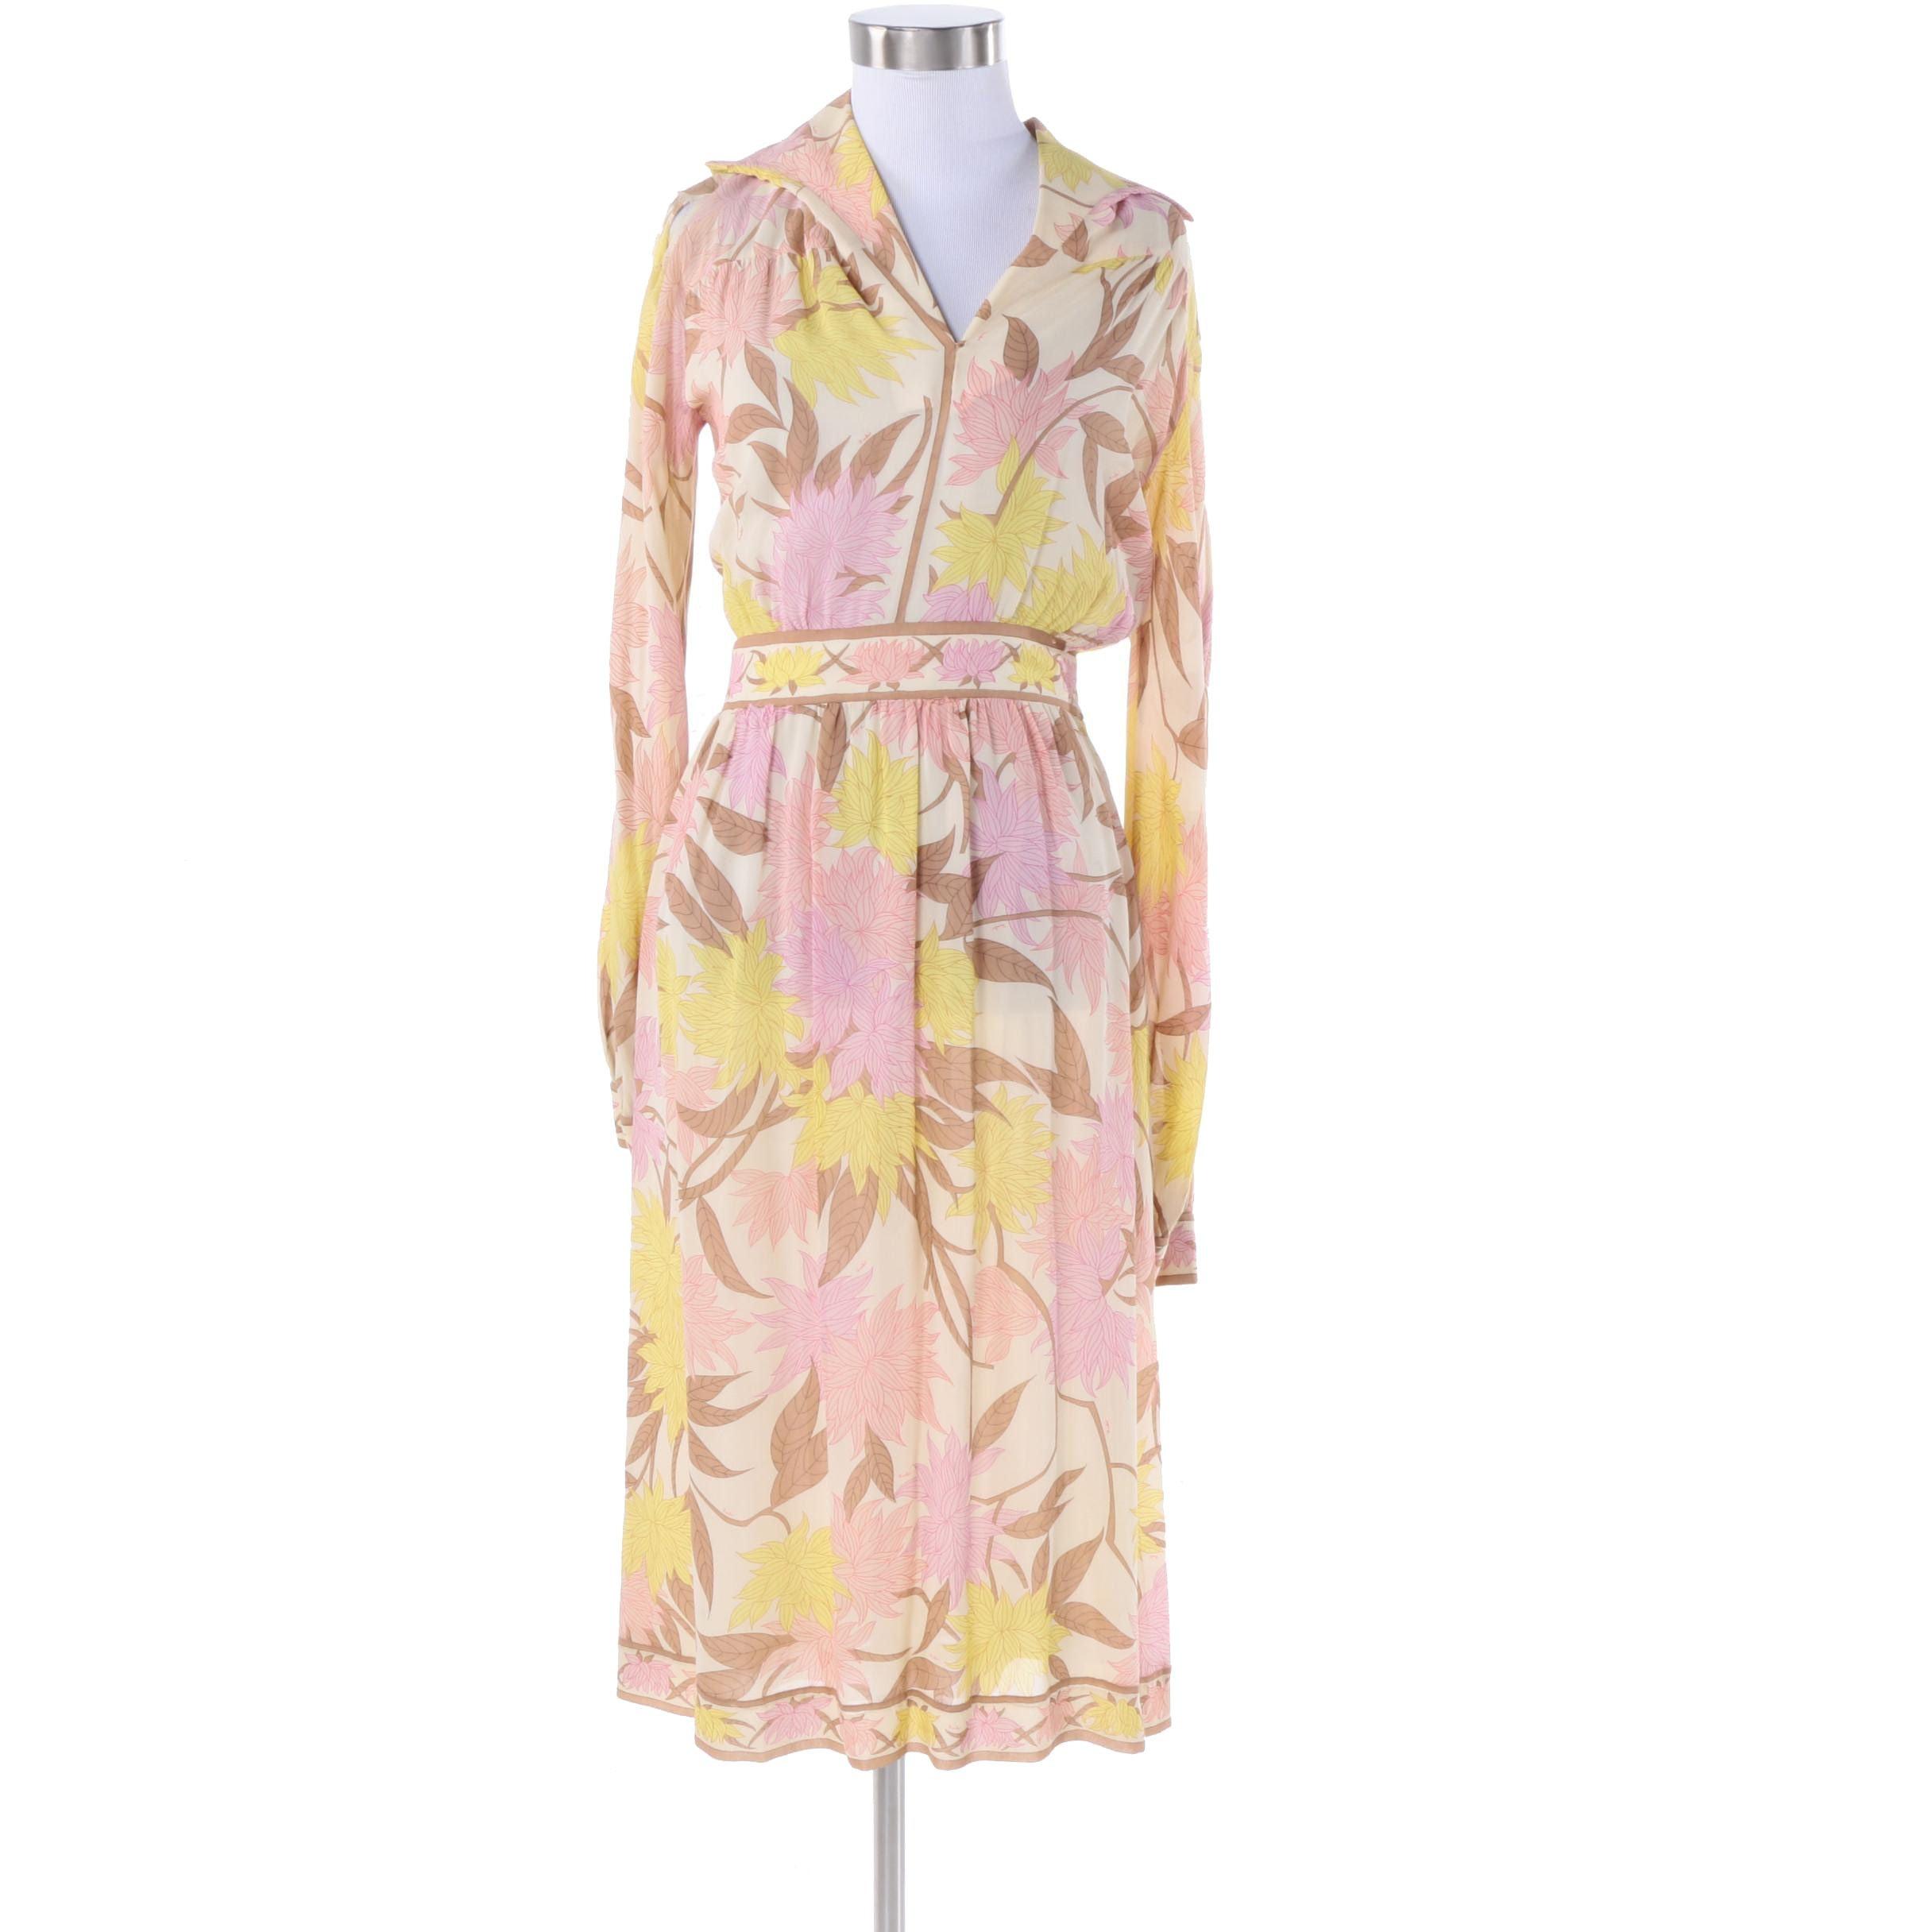 1970s Vintage Emilio Pucci Silk Dress